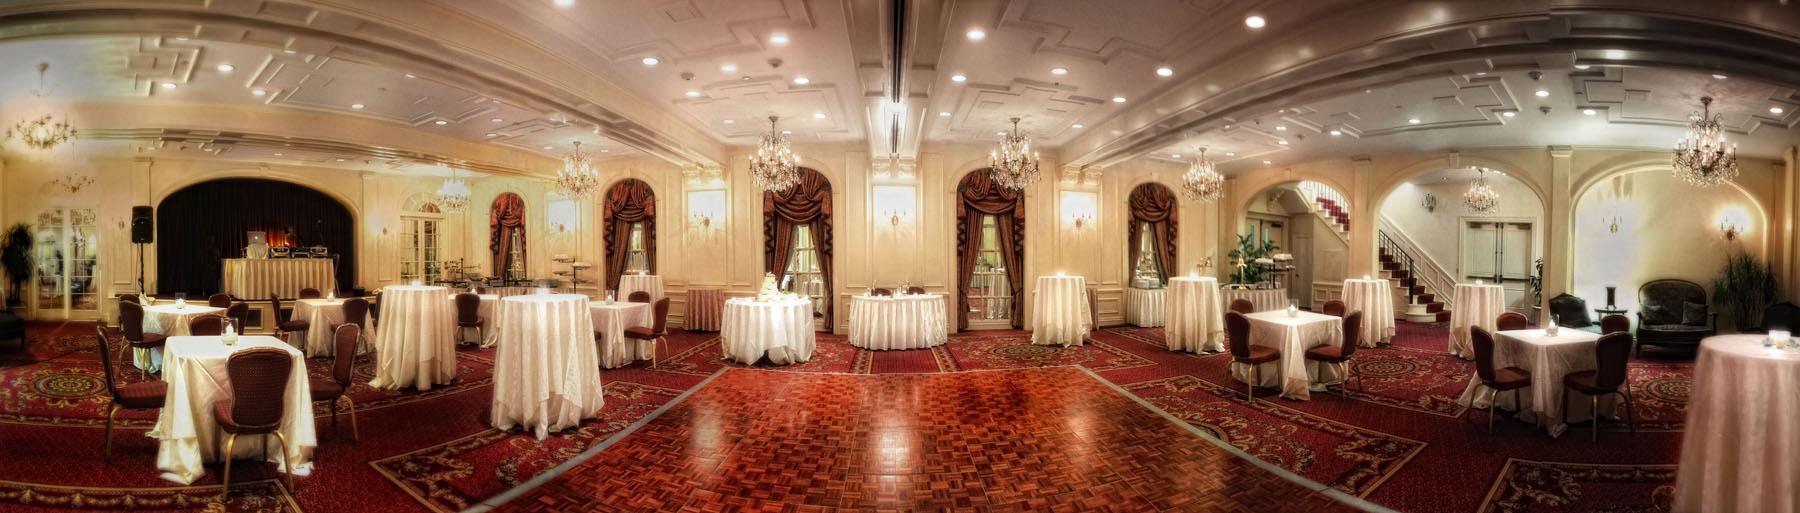 The Wentworth Grand Ballroom